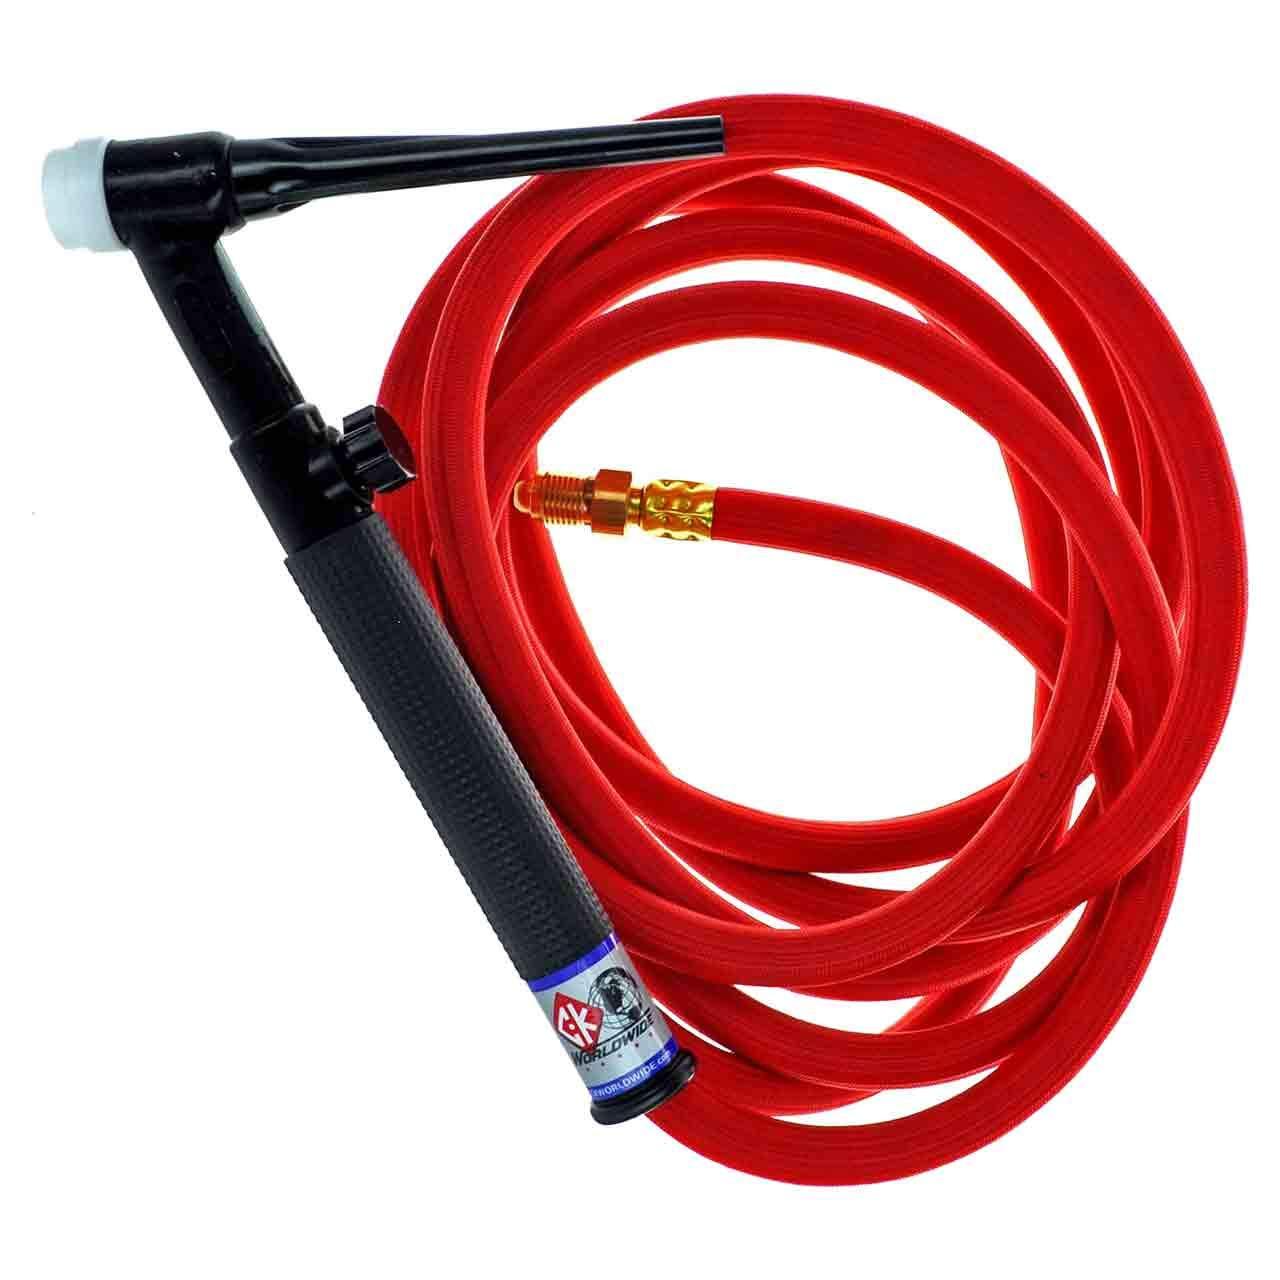 CK TL2112VHSF FX Torch Pkg 200 Amp Flex w/Valve 12-1/2' 1 Piece SuperF CK Worldwide